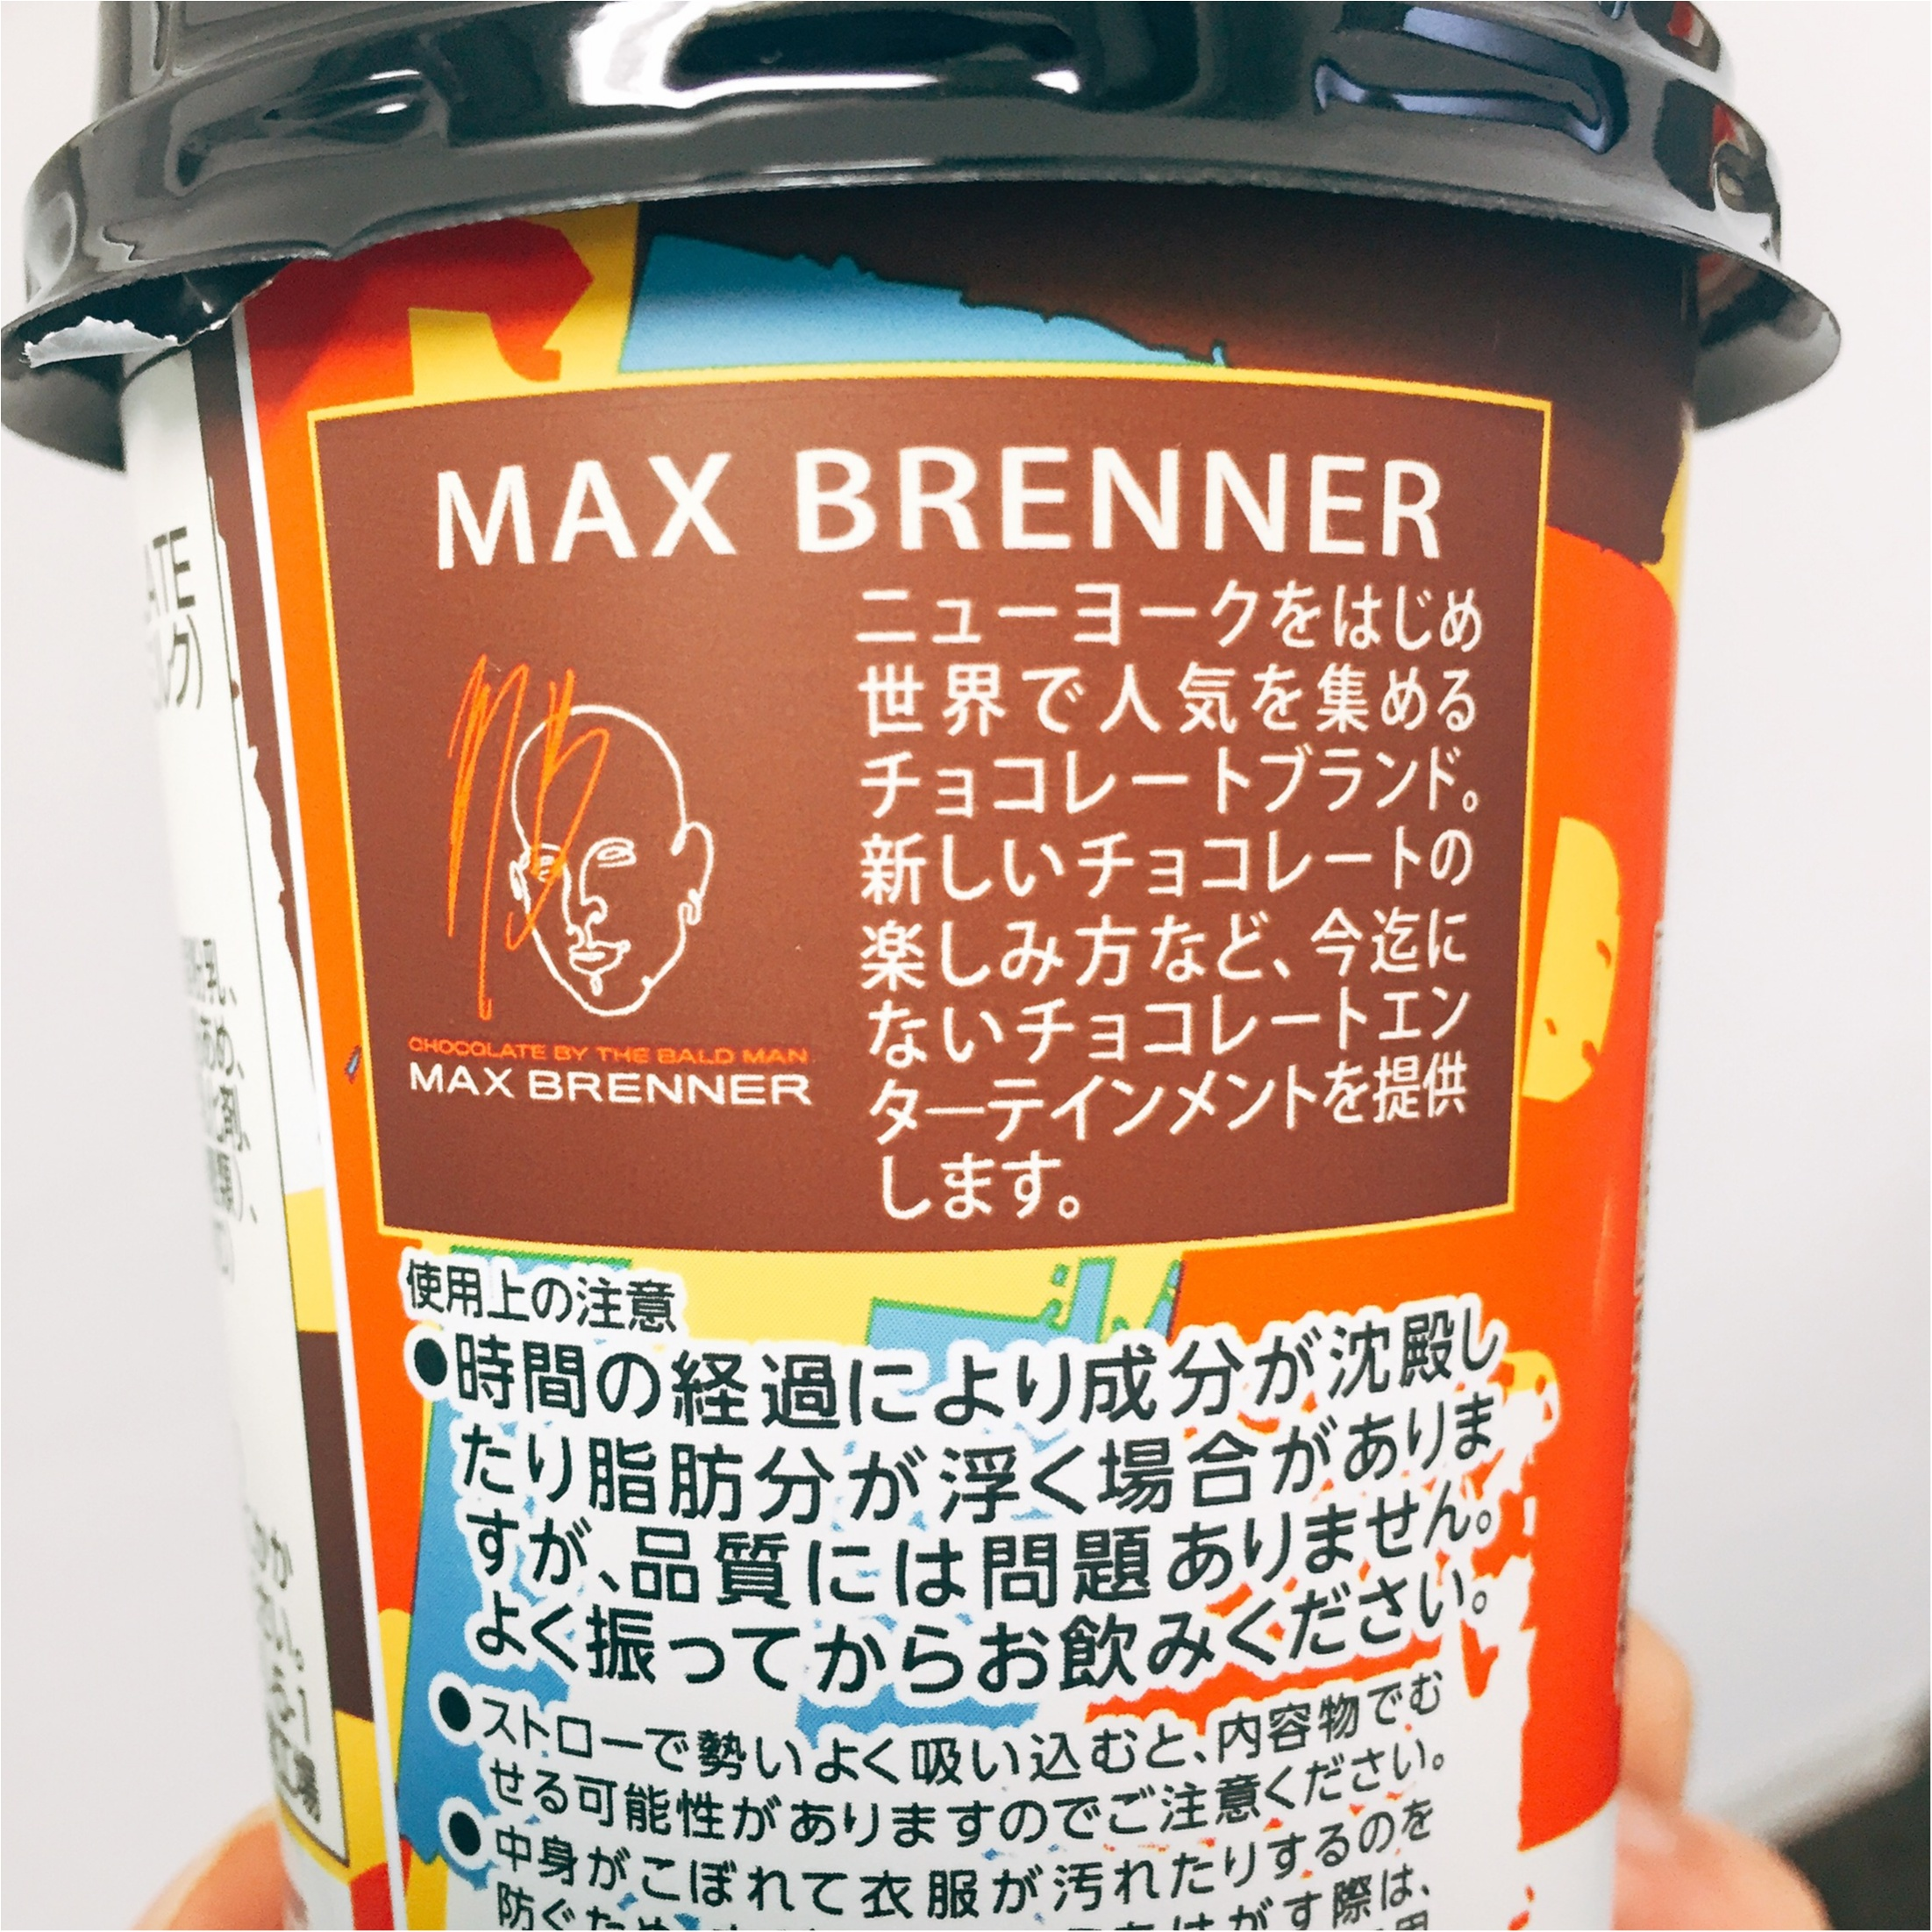 LAWSON限定!あの「MAX BRENNER」監修の濃厚チョコレートミルクドリンクを発見♡無くなり次第終了だから急いでー!_3